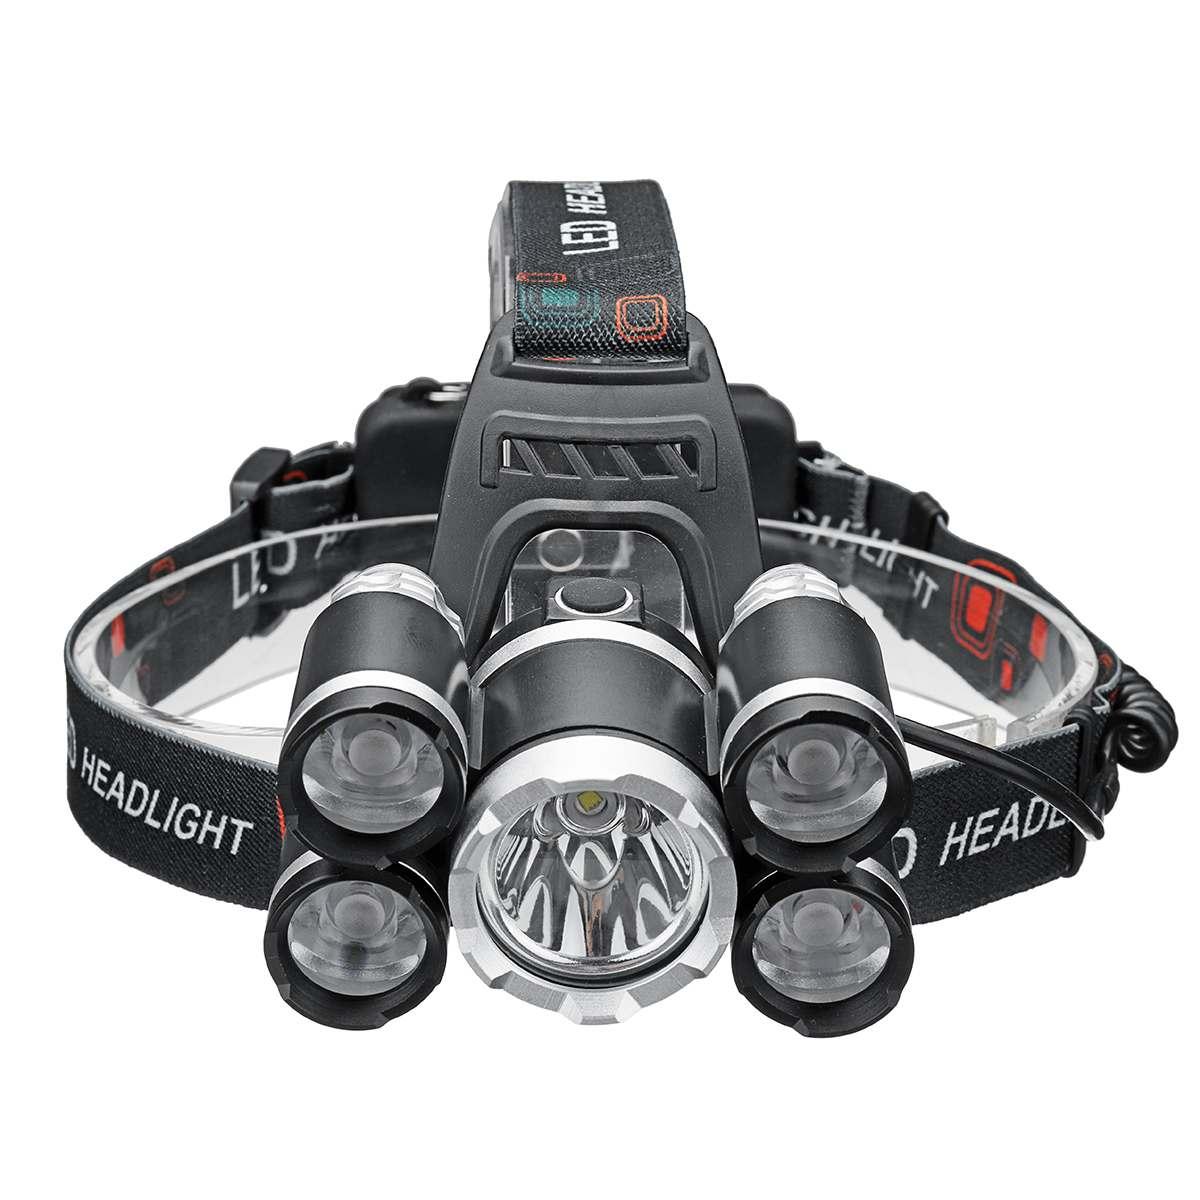 Clearance Black Headlight 50000lm 5*T6 LED Head Lamp Fishing Flashlight Torch Head Light Portable Camping Lantern